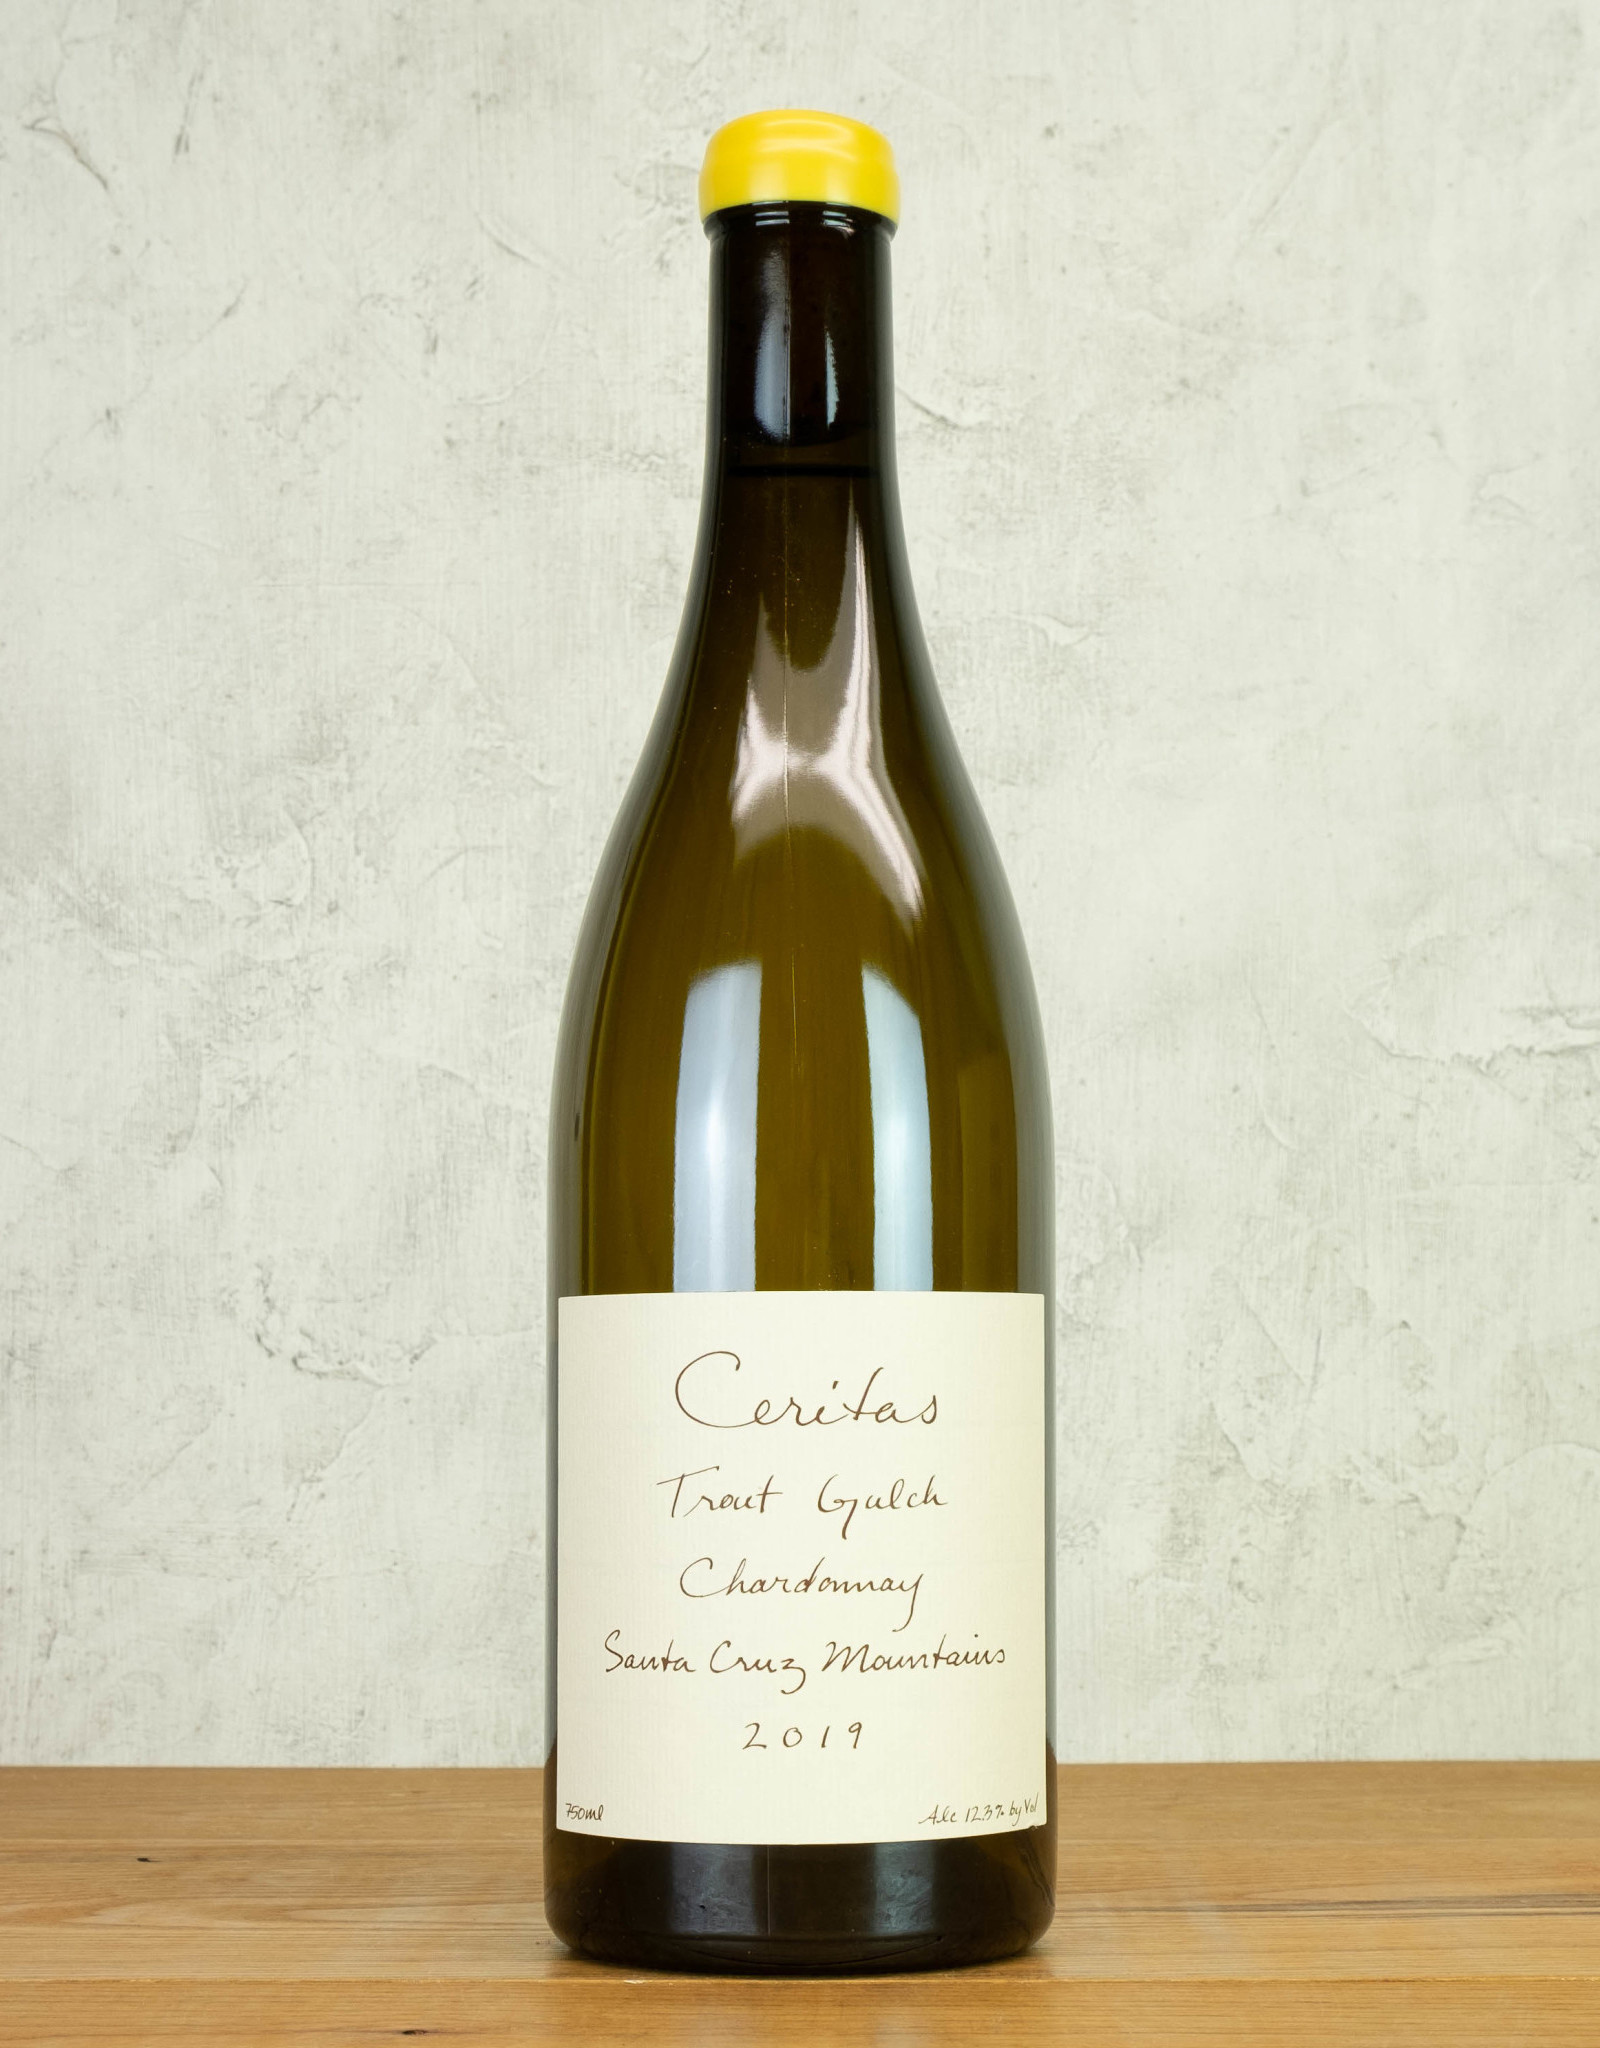 Ceritas Trout Gulch Chardonnay